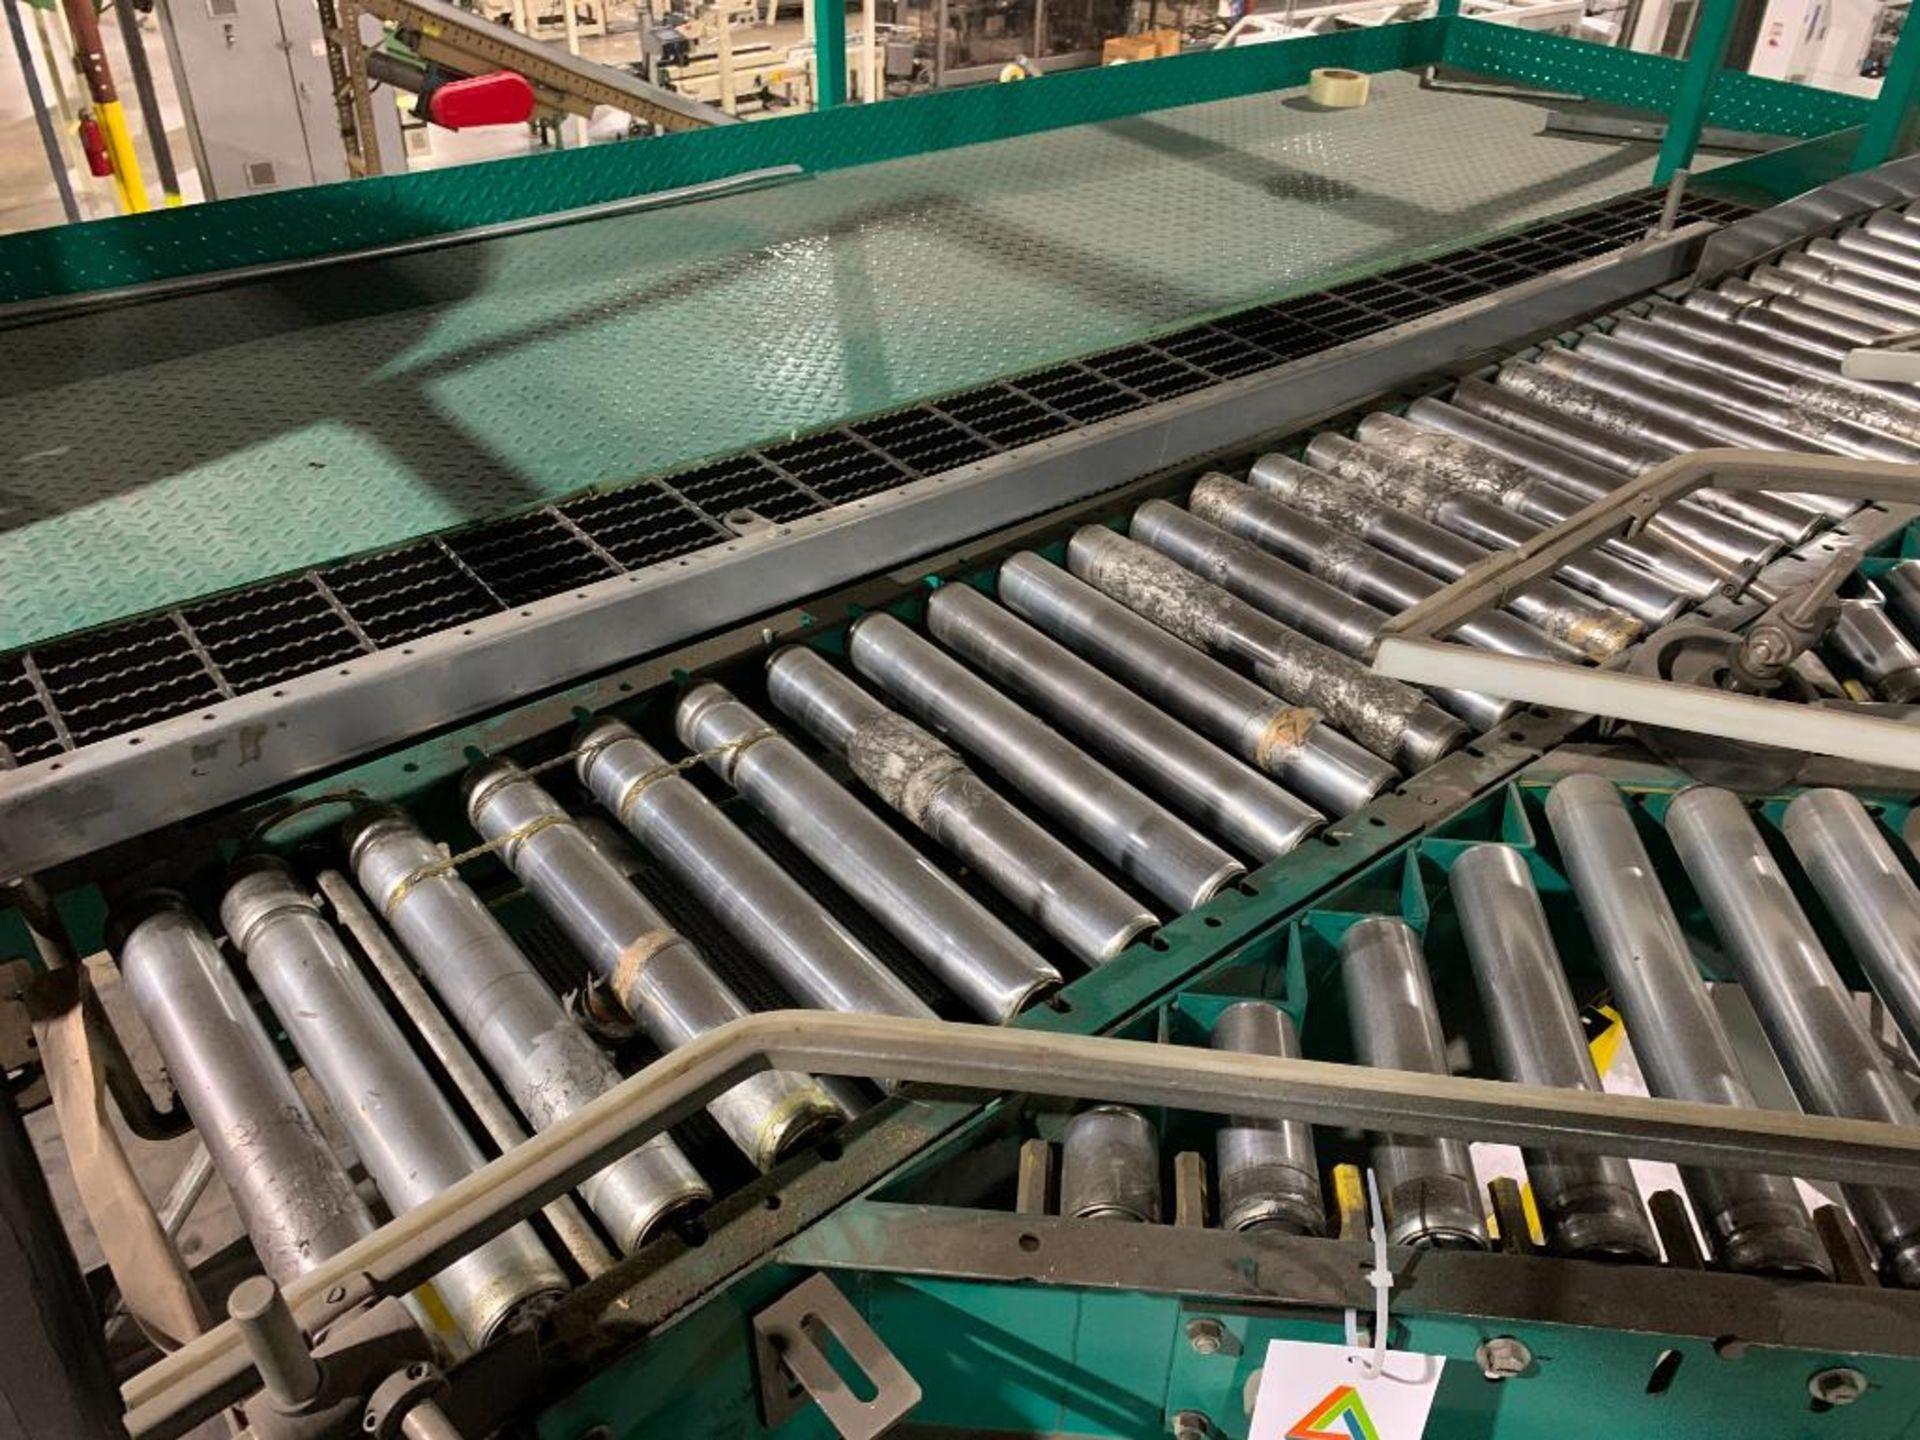 ACS power roller conveyor - Image 2 of 15